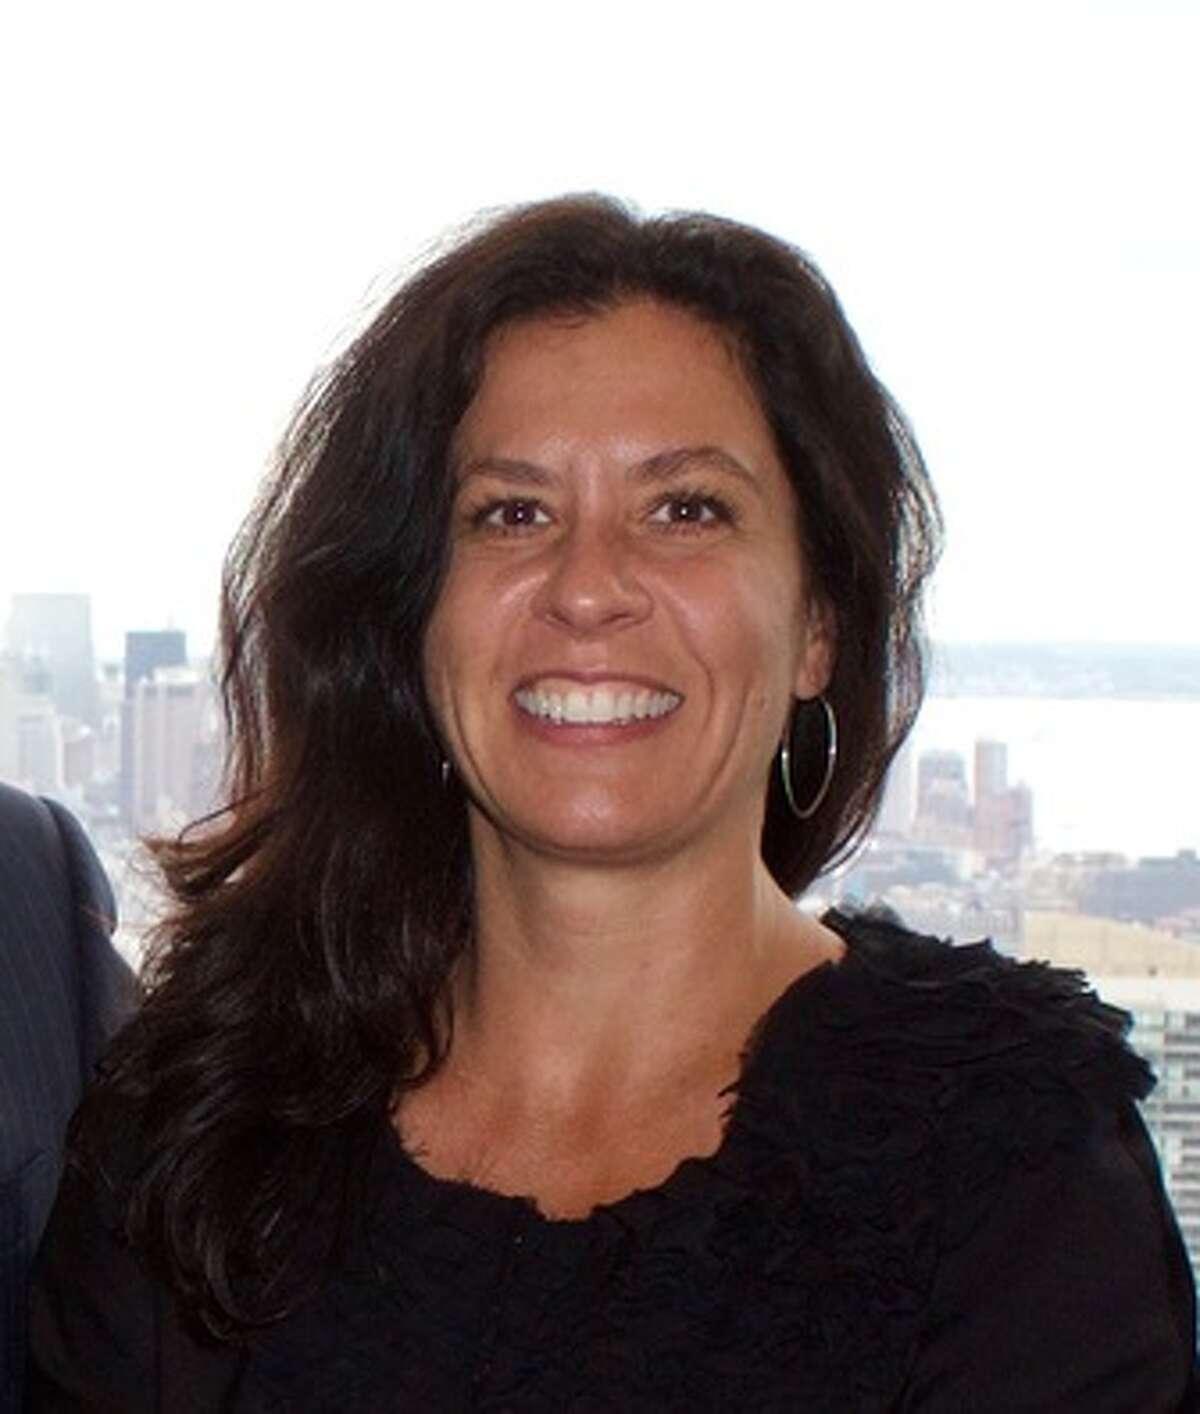 Maureen Hulbert,financial adviser with the SEAM Wealth Management Group at Merrill Lynch